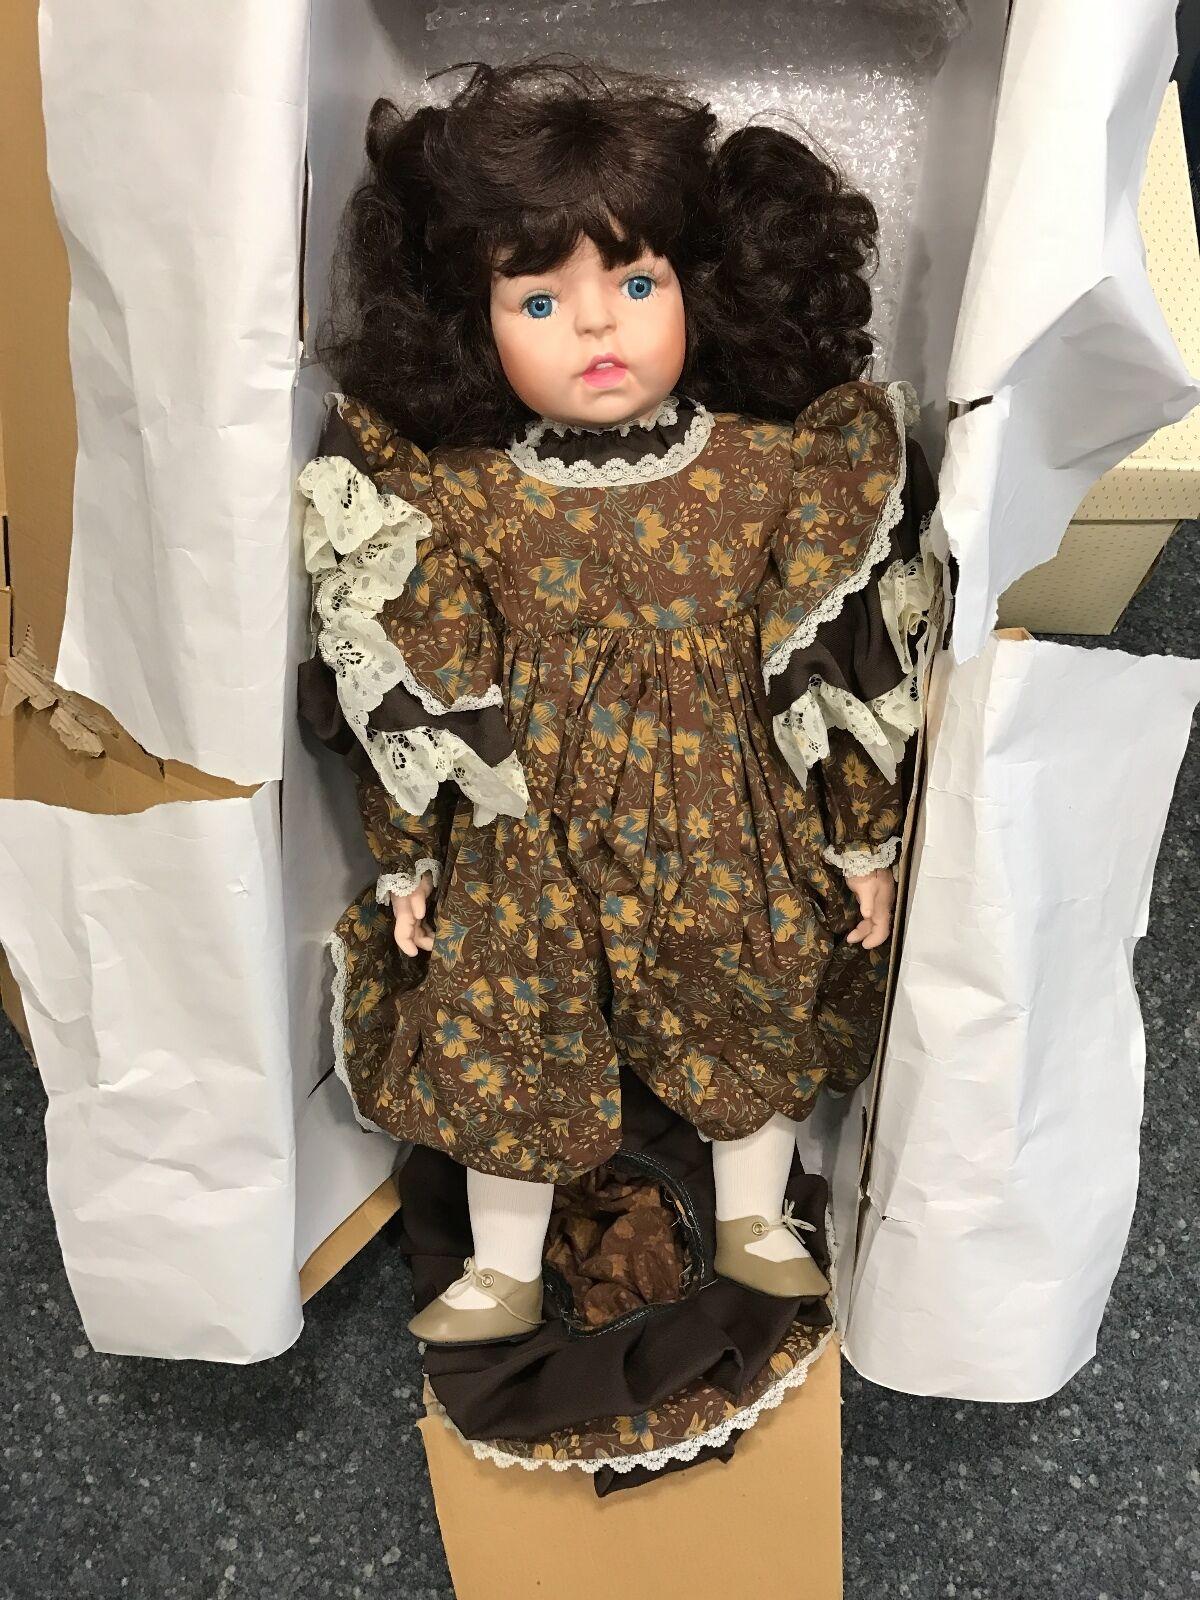 Artistas muñeca muñeca de porcelana 73 cm. top estado